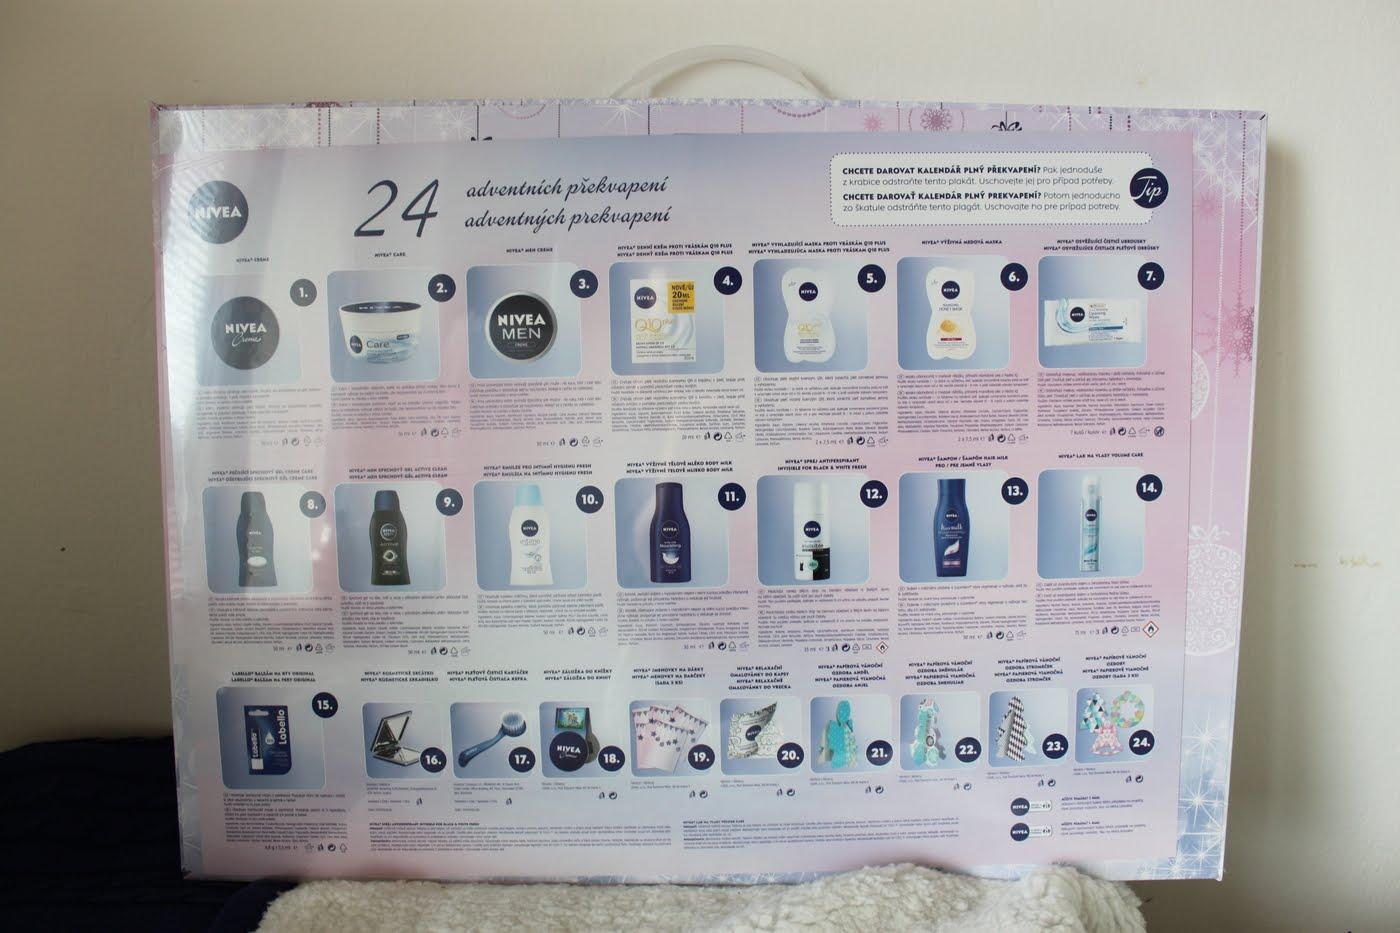 nivea adventni kalendar Adventní kalendáře trochu zblízka   Balea, Nivea   Blogerky.cz nivea adventni kalendar